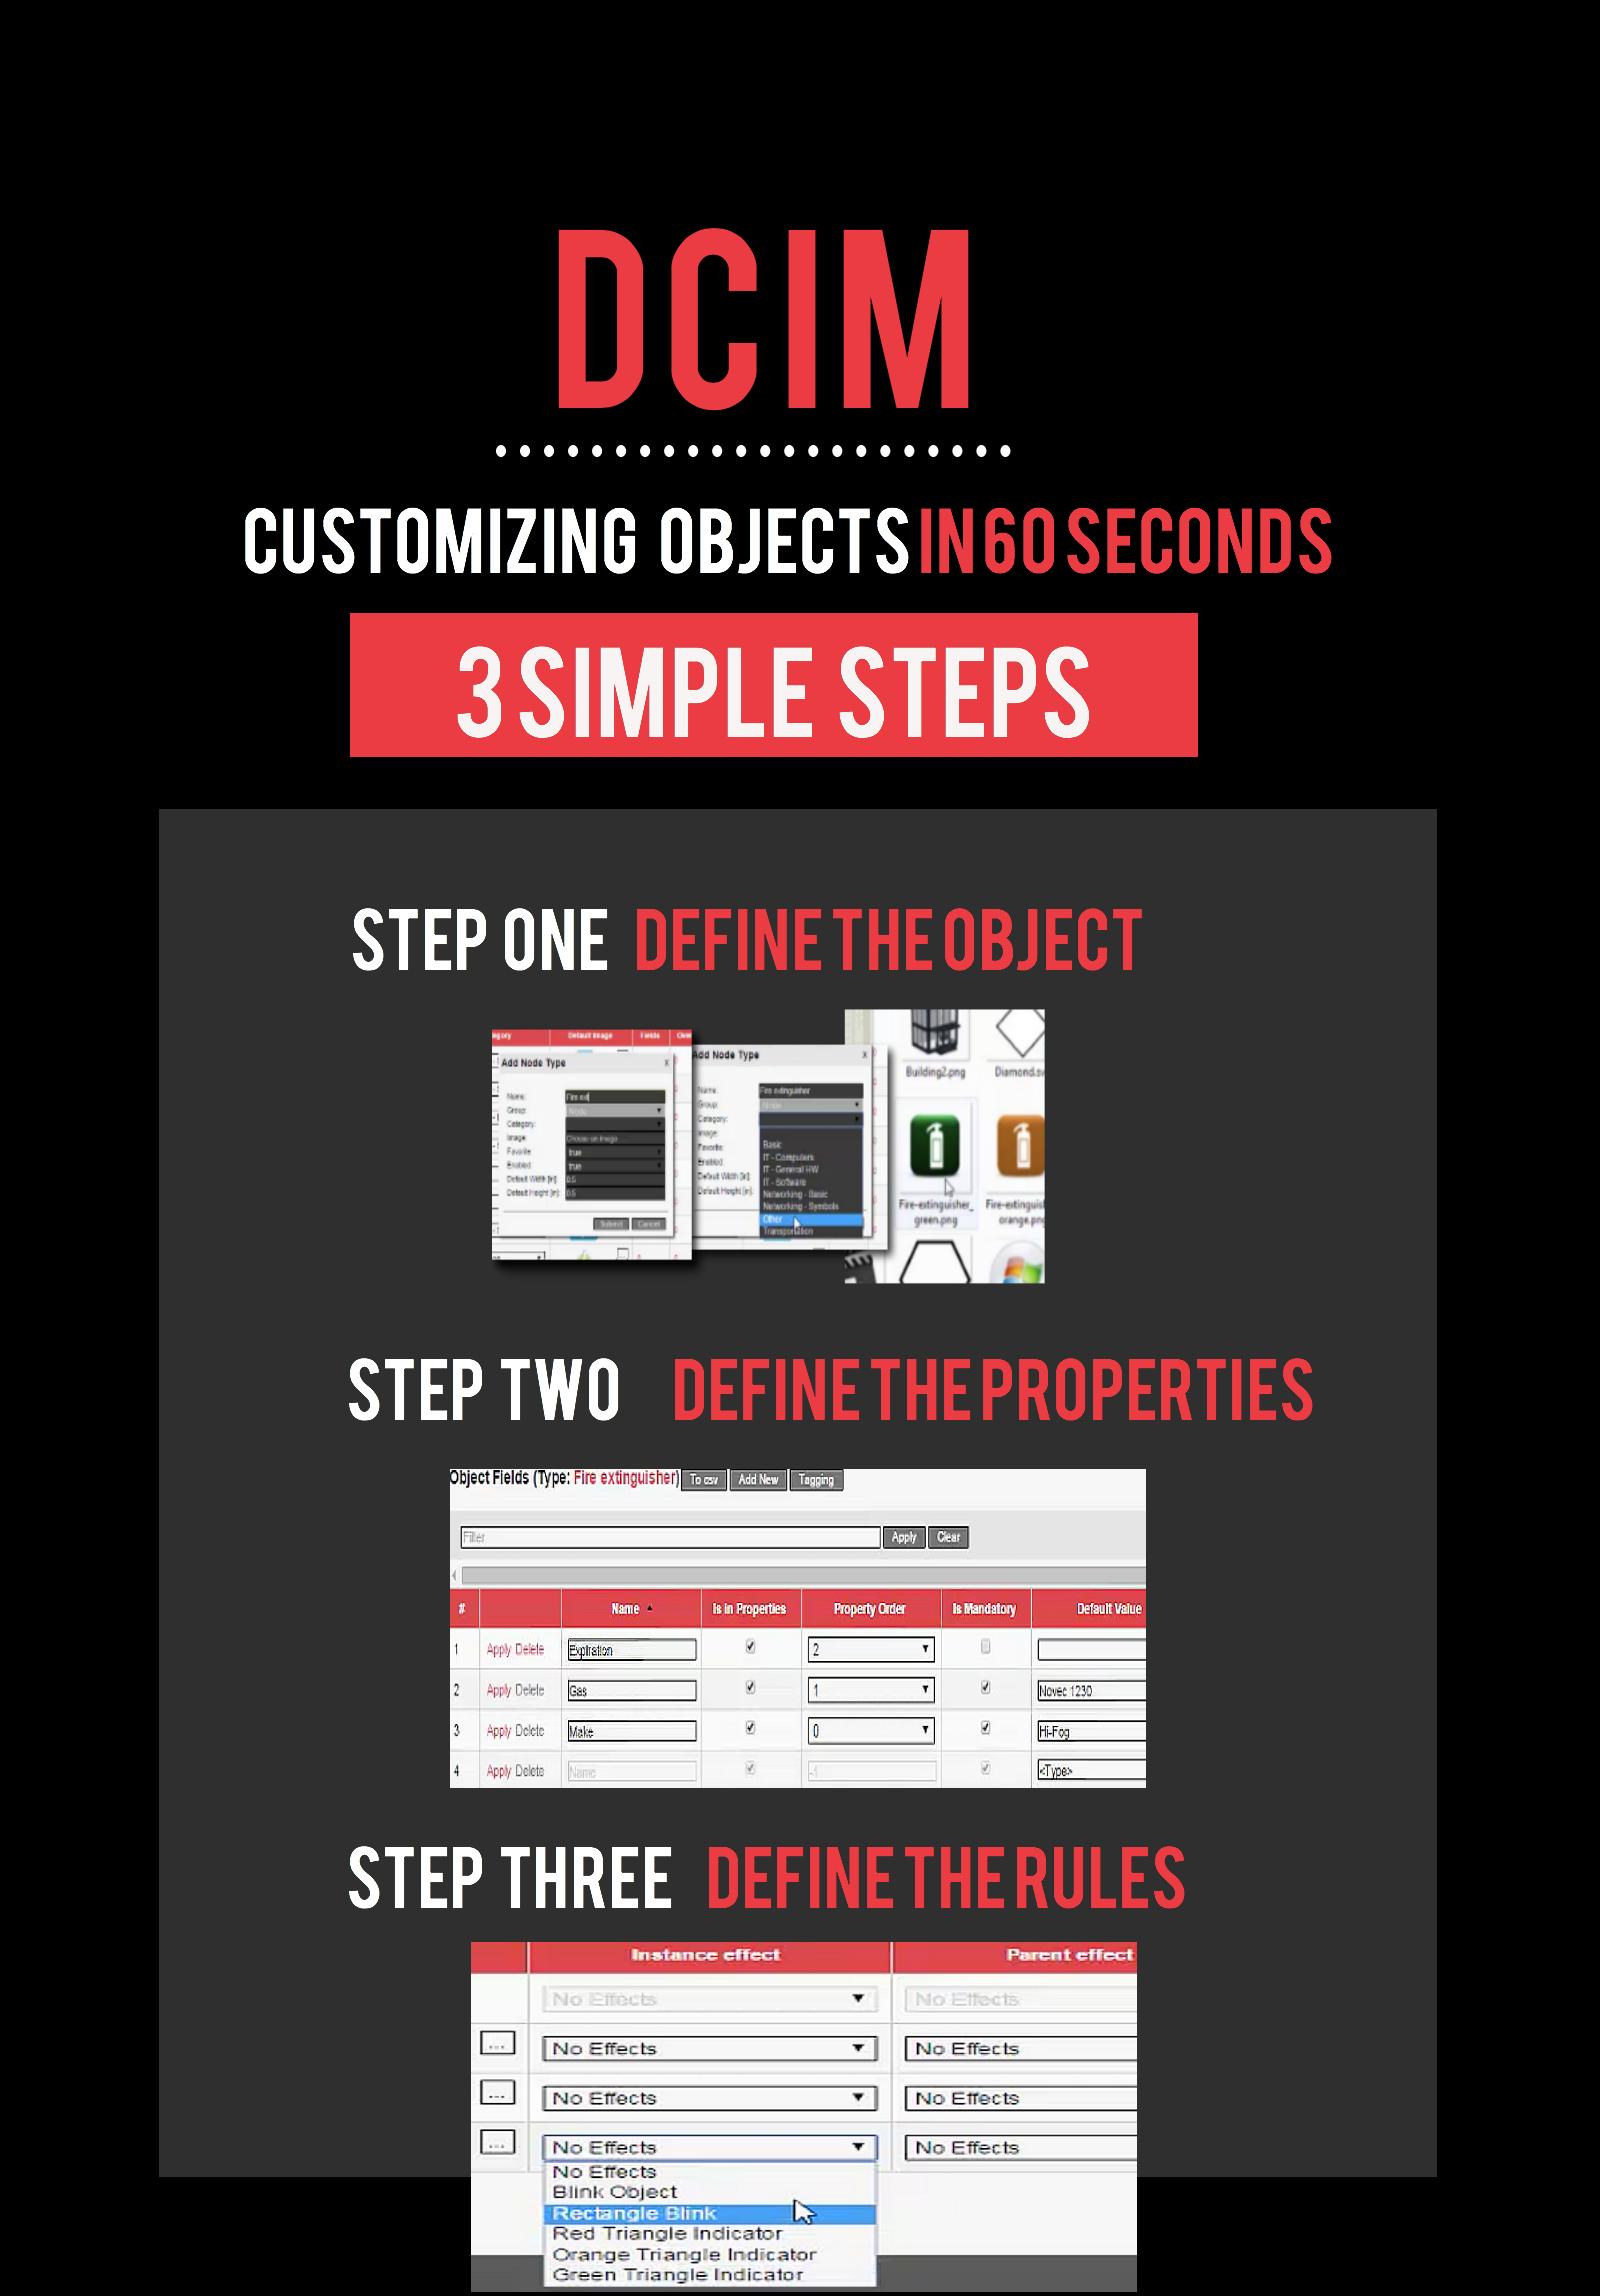 DCIM infographic